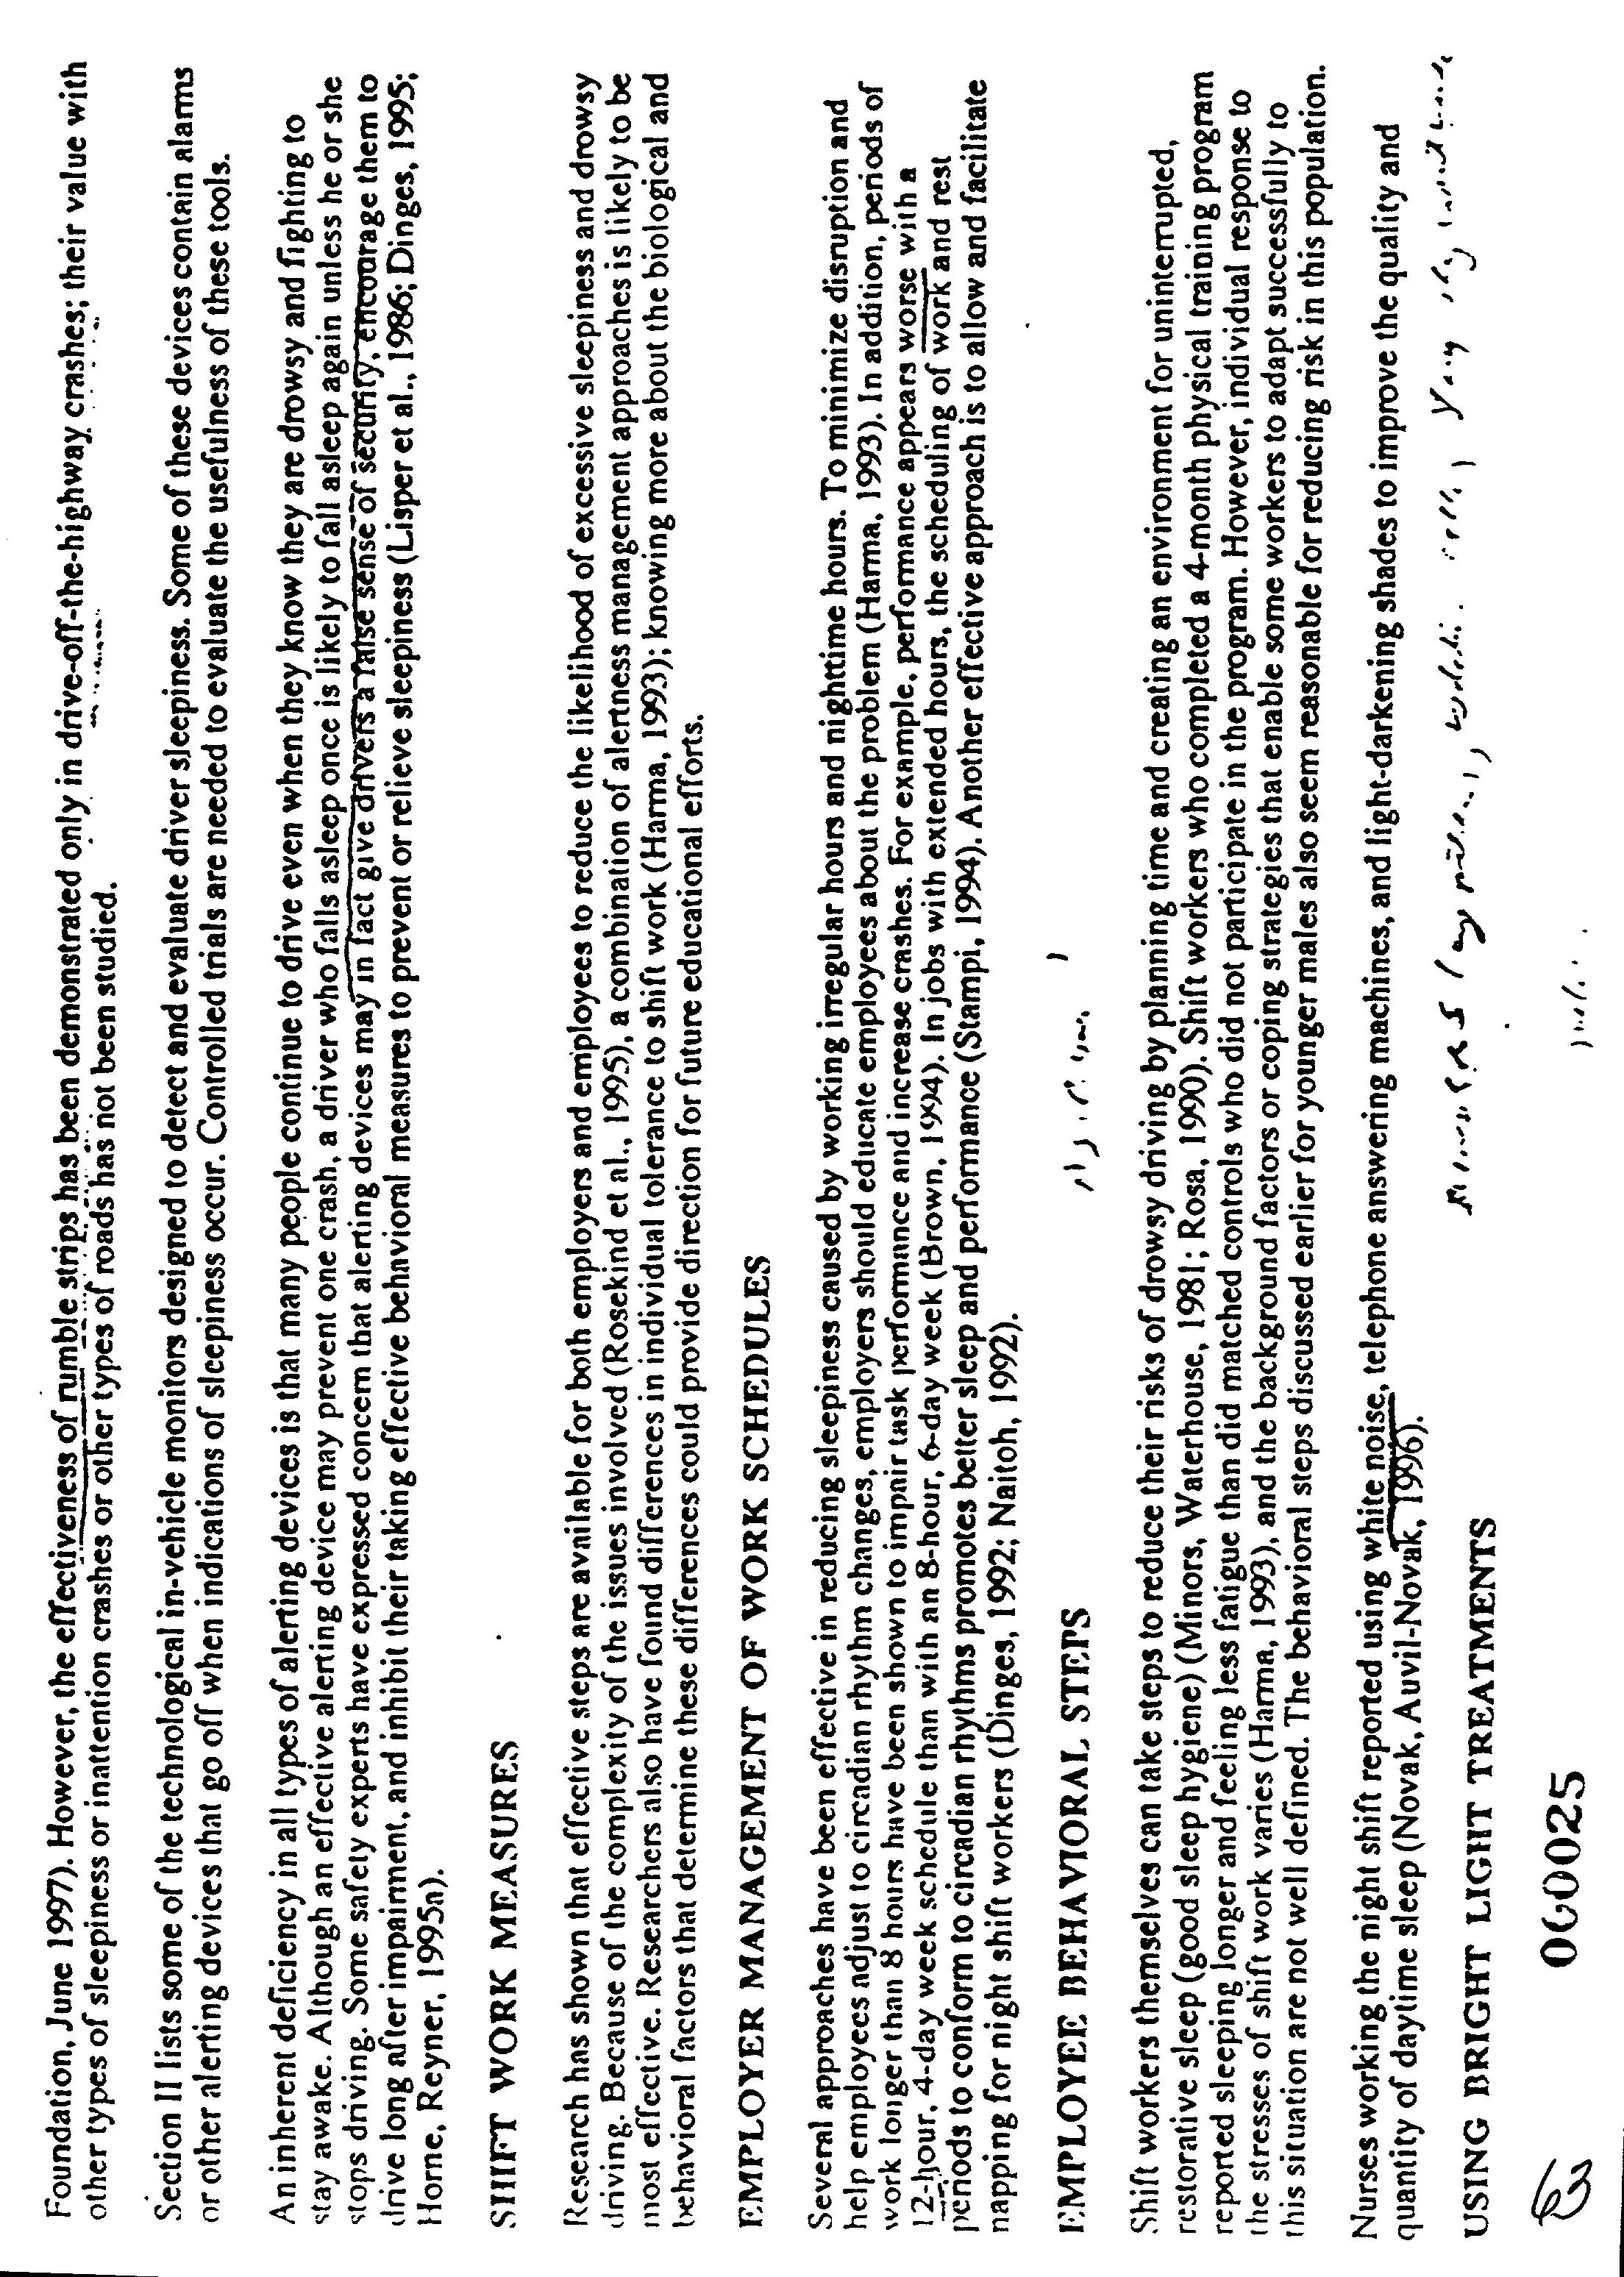 Figure US20020105438A1-20020808-P00025